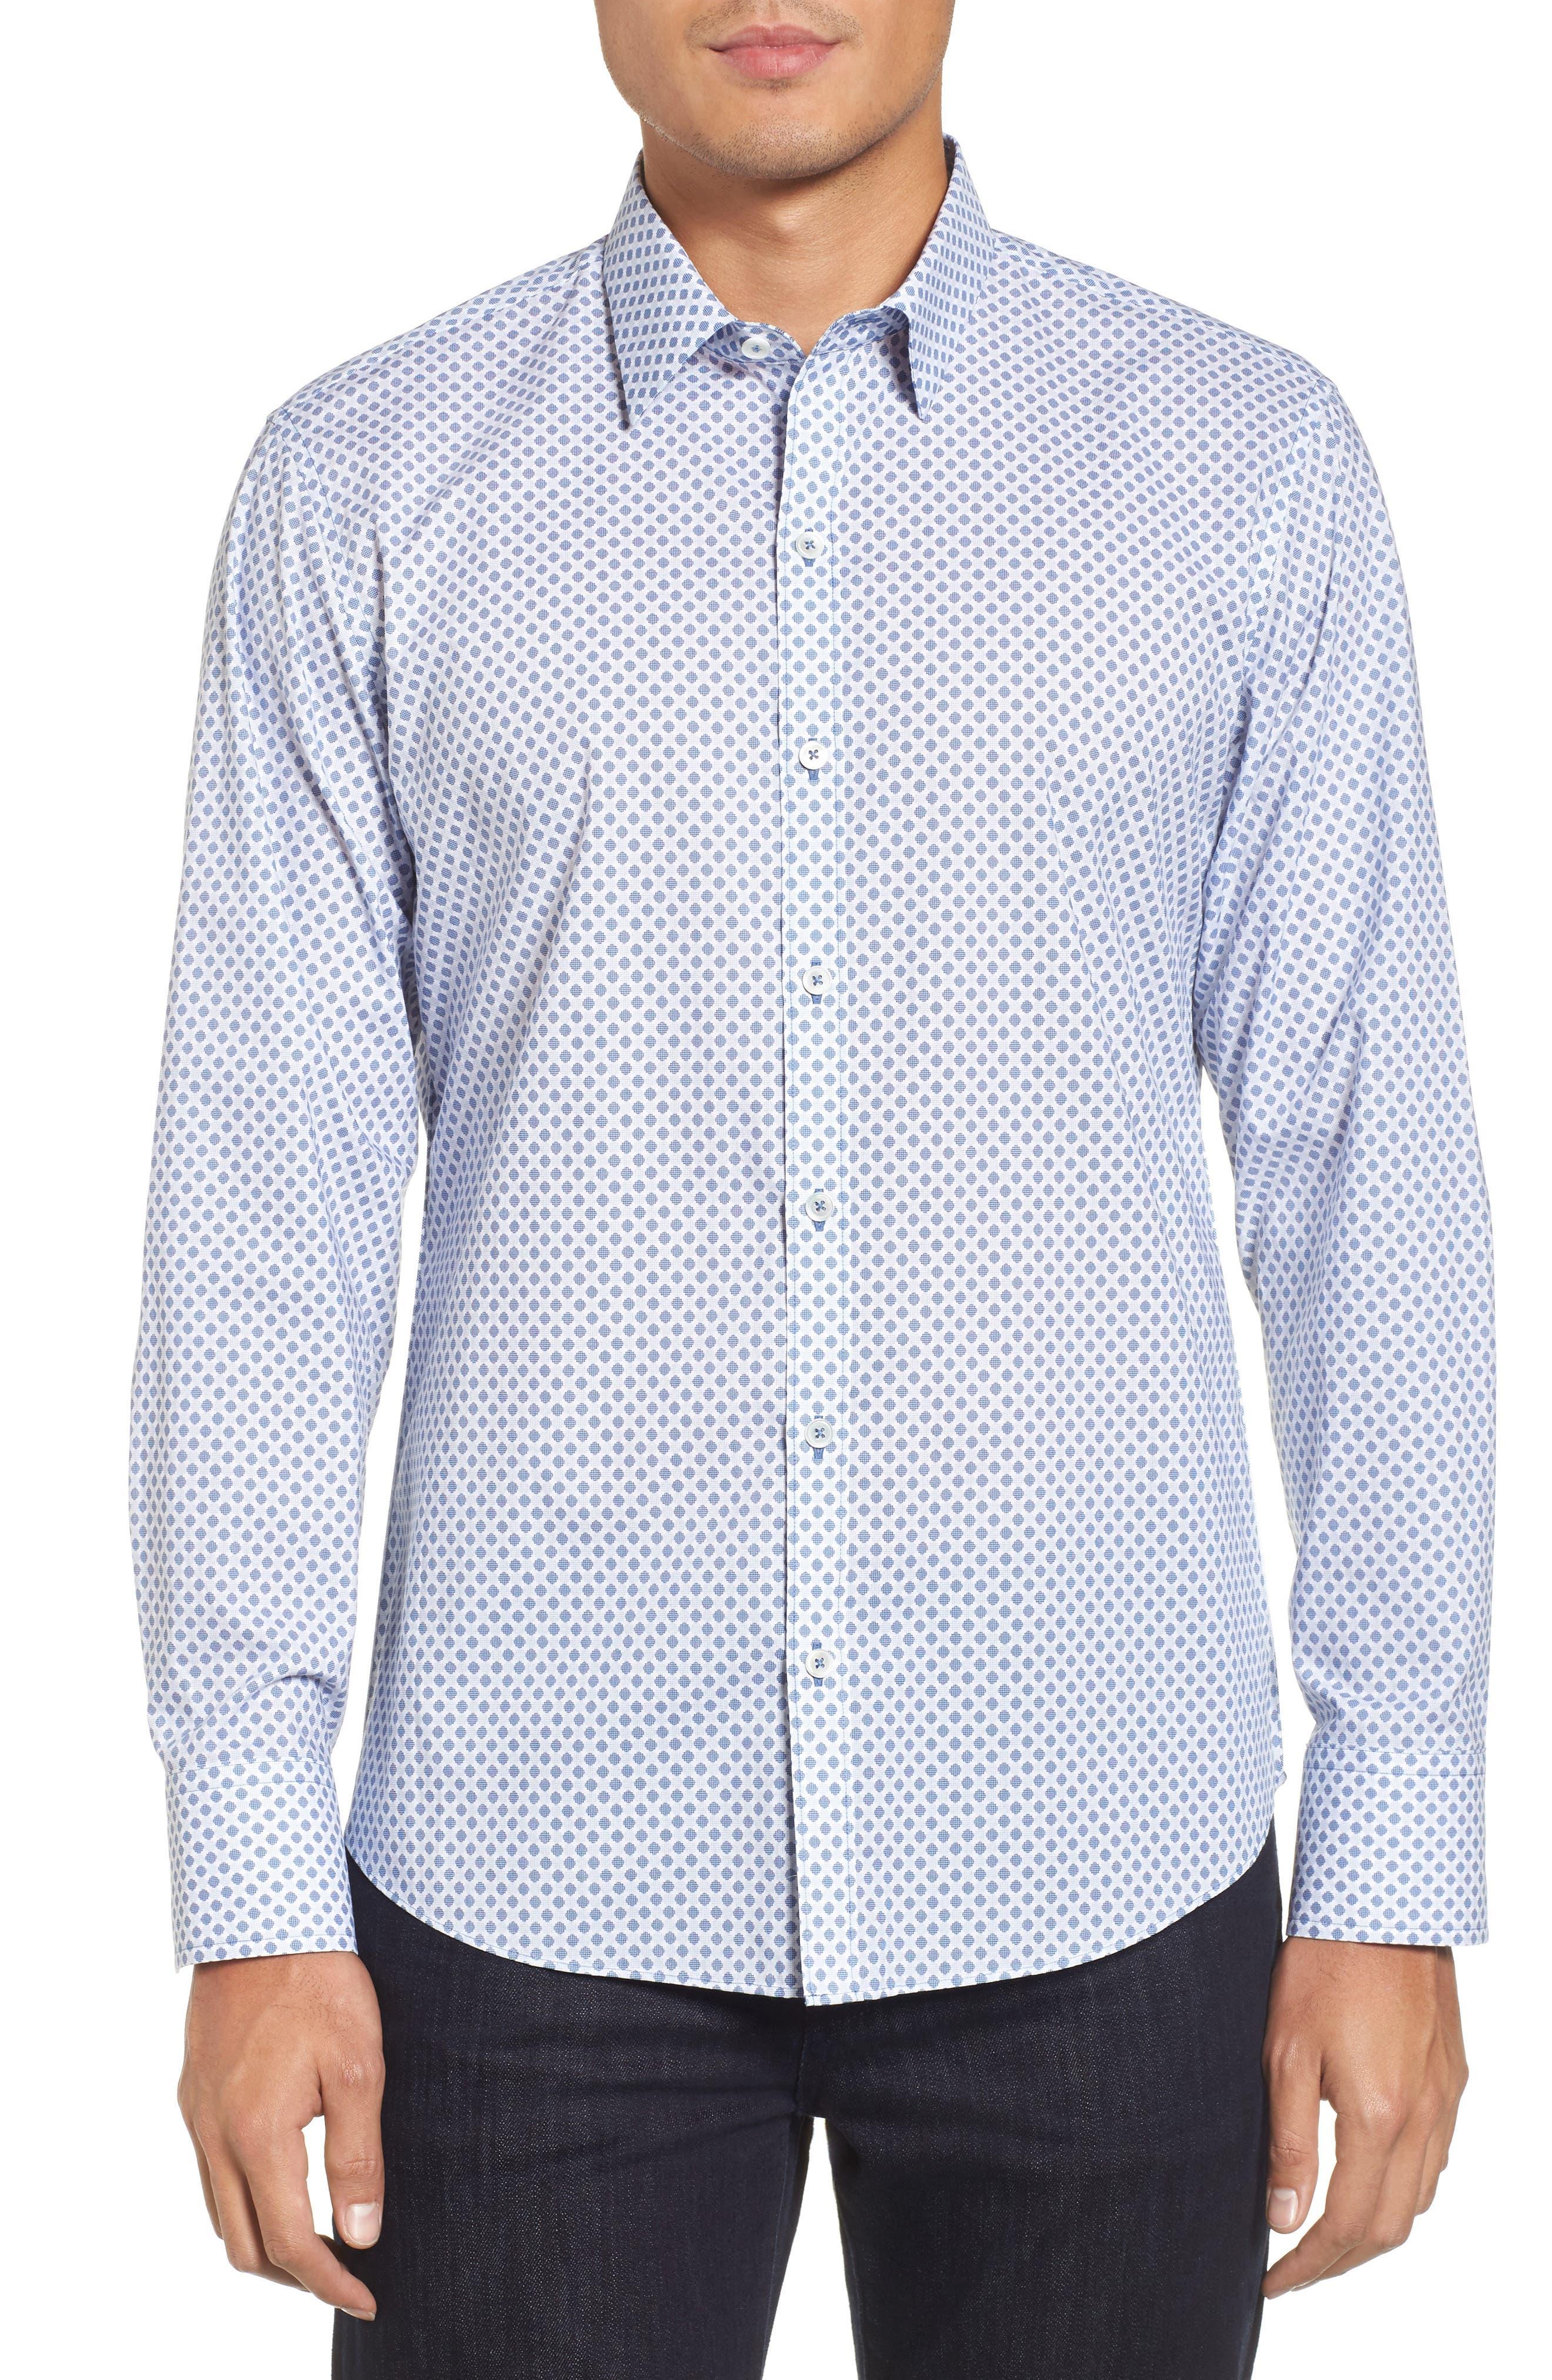 Obi Slim Fit Circle Print Sport Shirt,                         Main,                         color, Navy